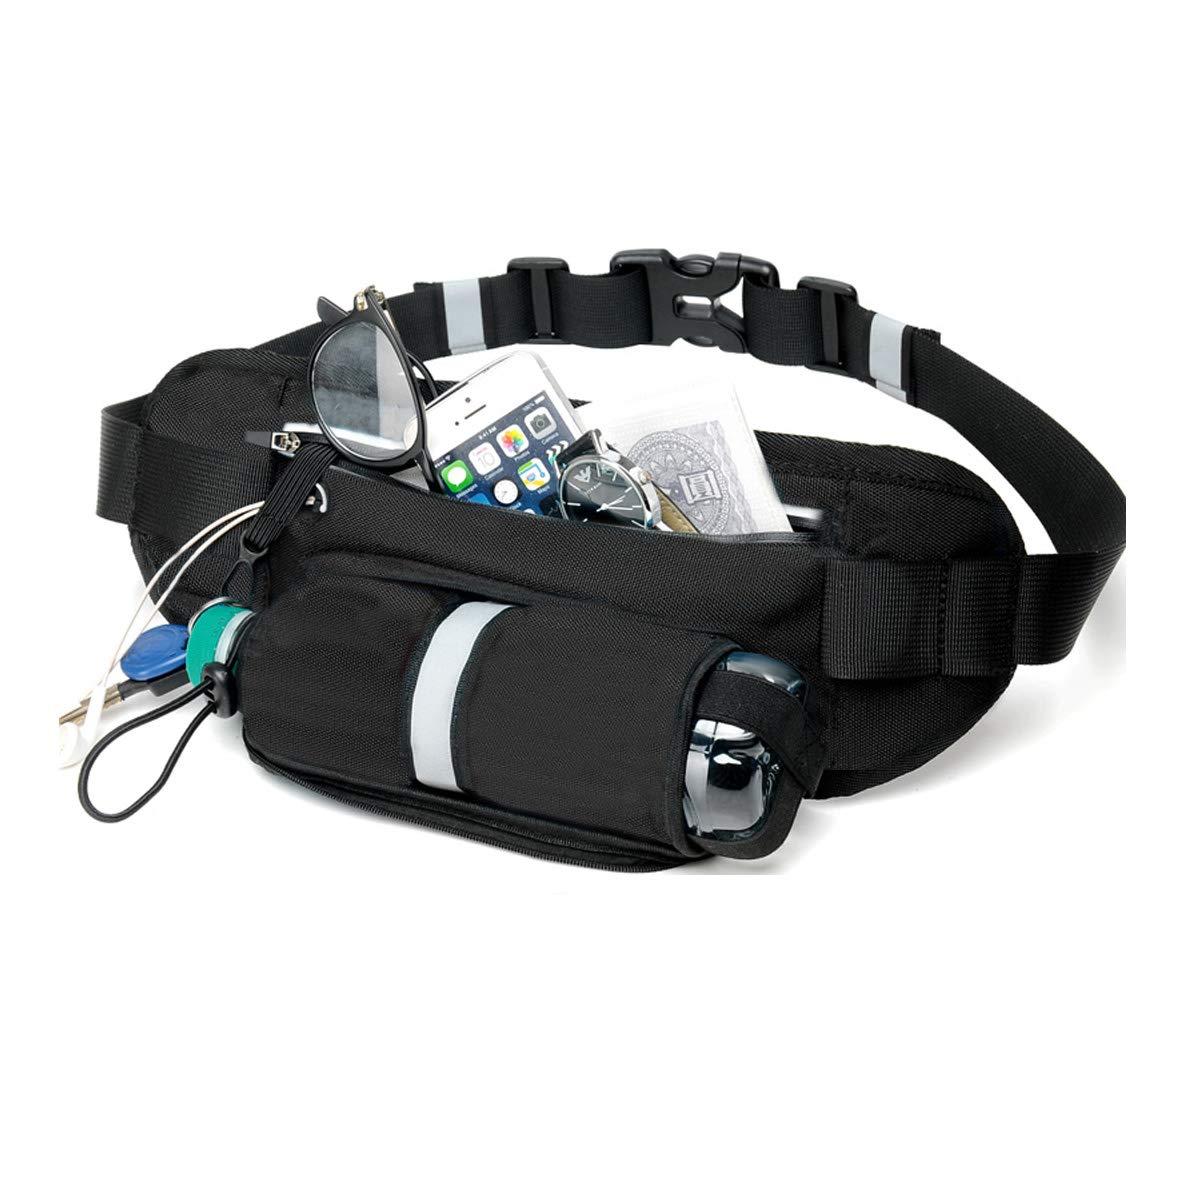 MYCARBON Running Belt with Water Bottle Holder,Waterproof Sport Bum Bag,Cycling Waist Bag Dog Walking Bag Jogging Belt for Exercise,Travel,Outdoor Activities for Phones Below 6 inch